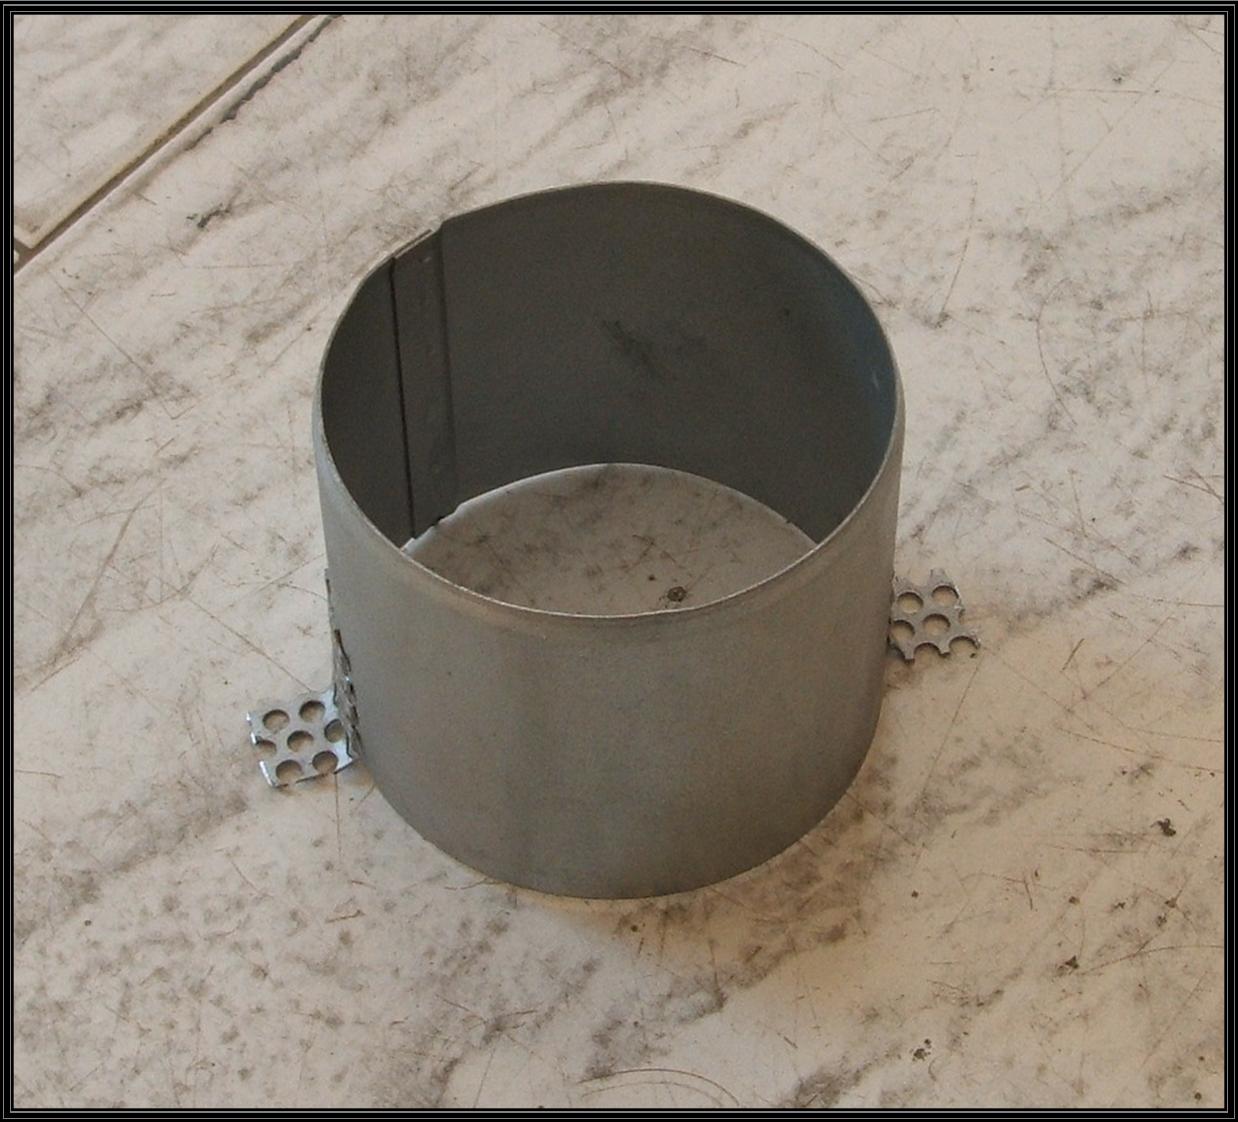 Chimeneas sierra manguito para rejilla para tubo flexible - Rejillas para chimeneas ...